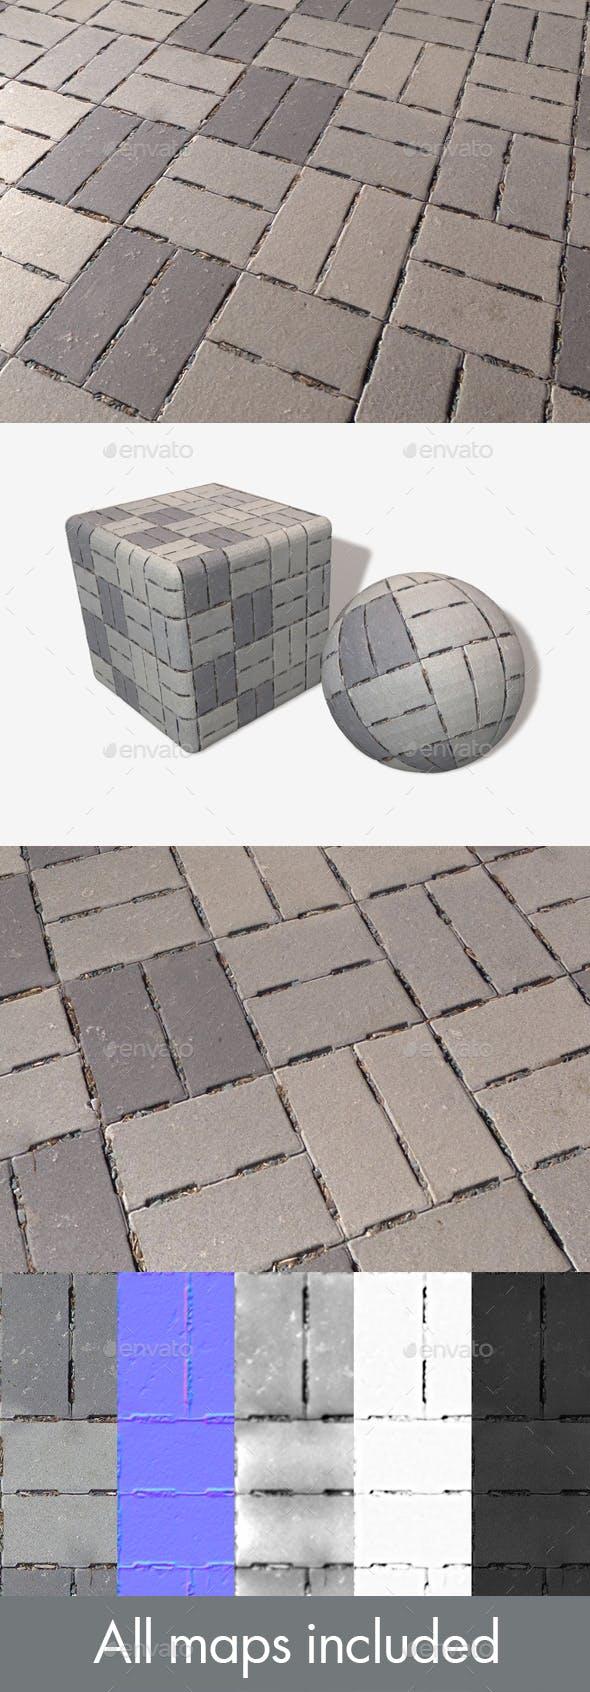 Concrete Brick Flooring Seamless Texture - 3DOcean Item for Sale